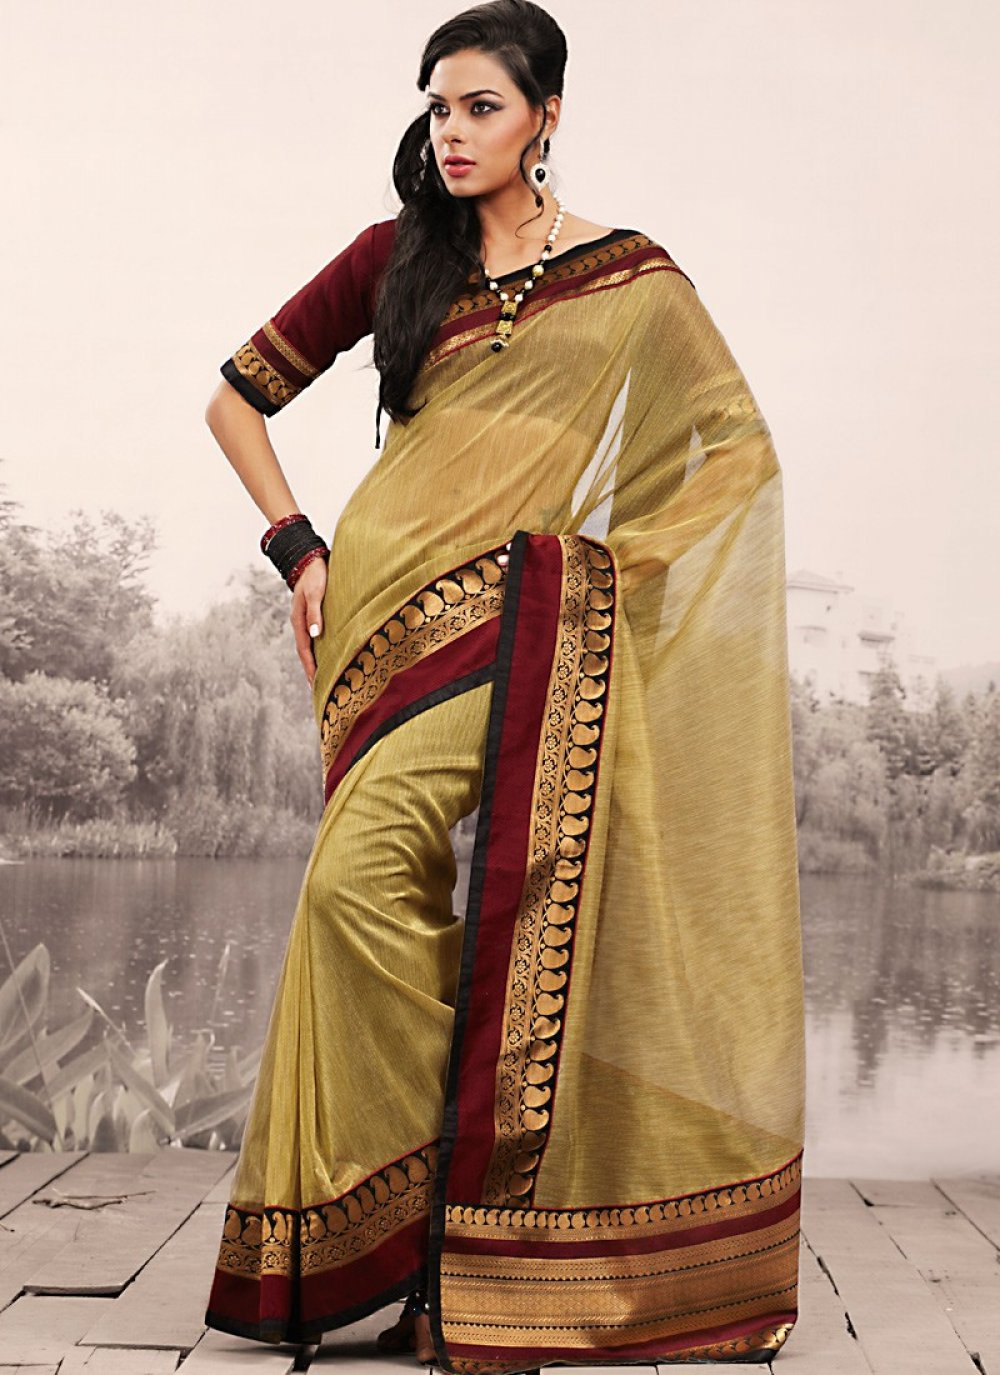 Bige Brown Embroidered Saree